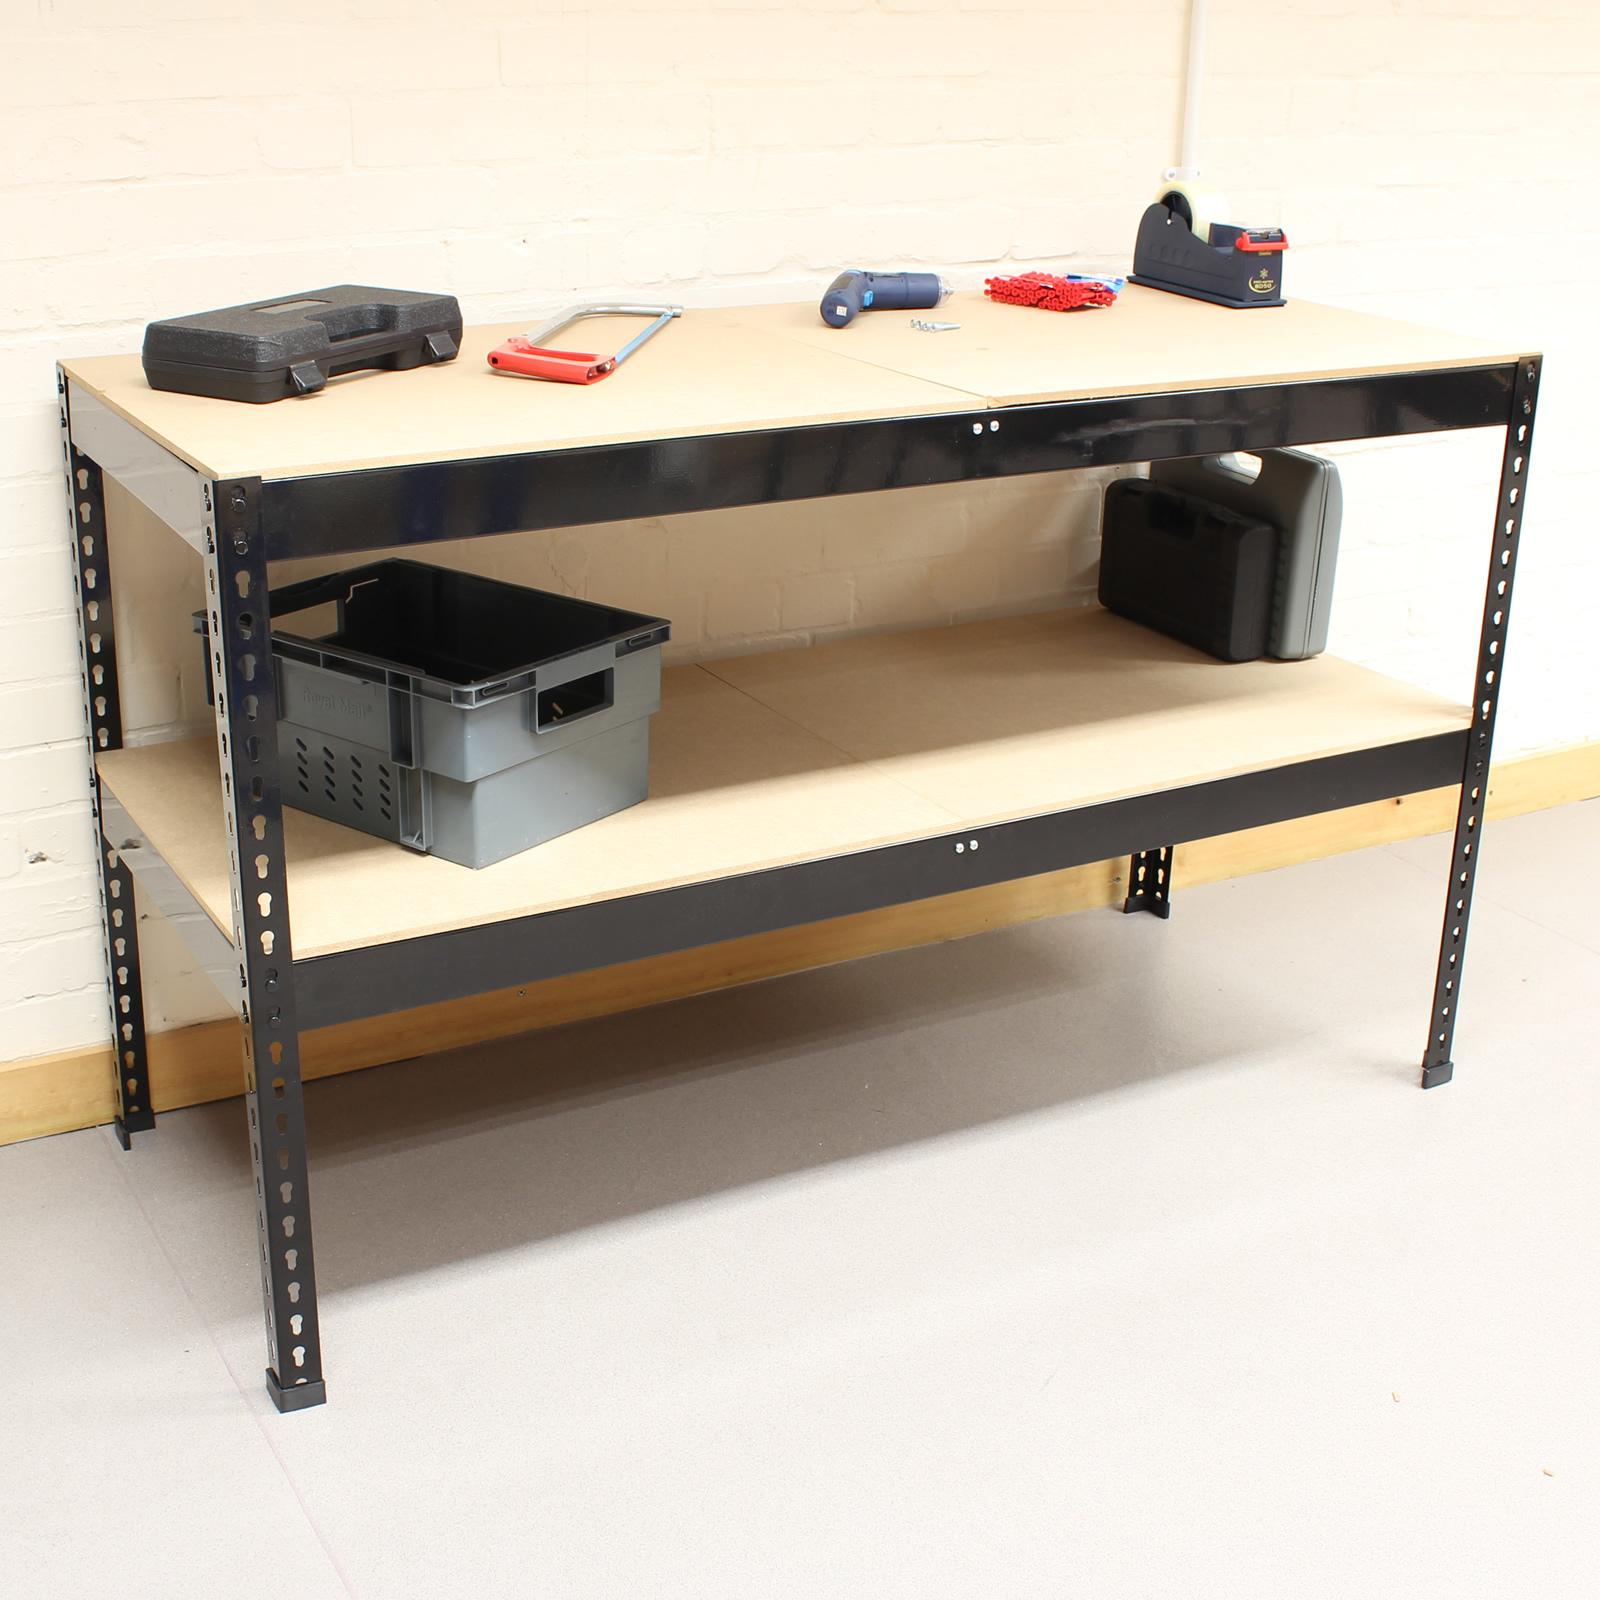 Black Heavy Duty Steel Work Bench Station Shelves For Garage Warehouse Shed Ebay